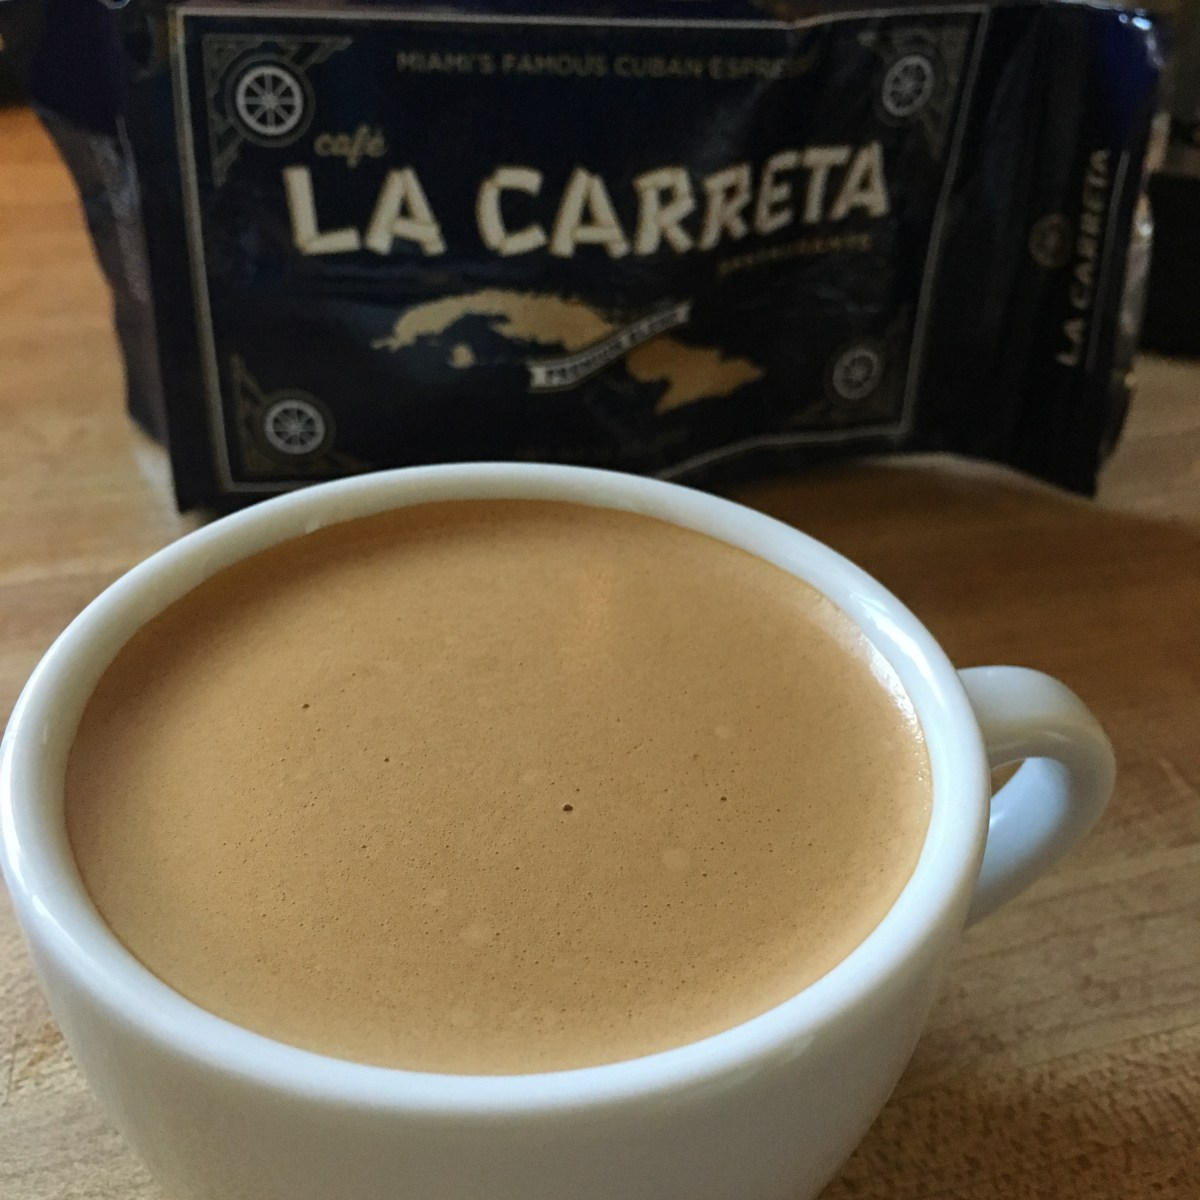 Cuban Coffee | Coffee shop patrons gossip, drink cuban